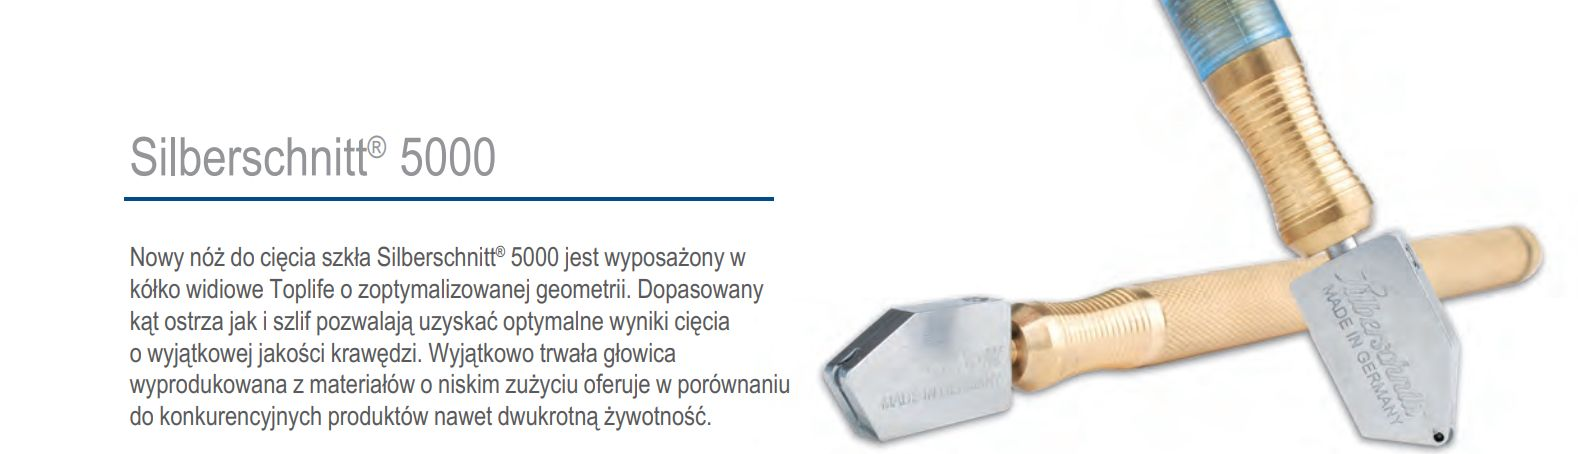 noz-do-szkla-5000